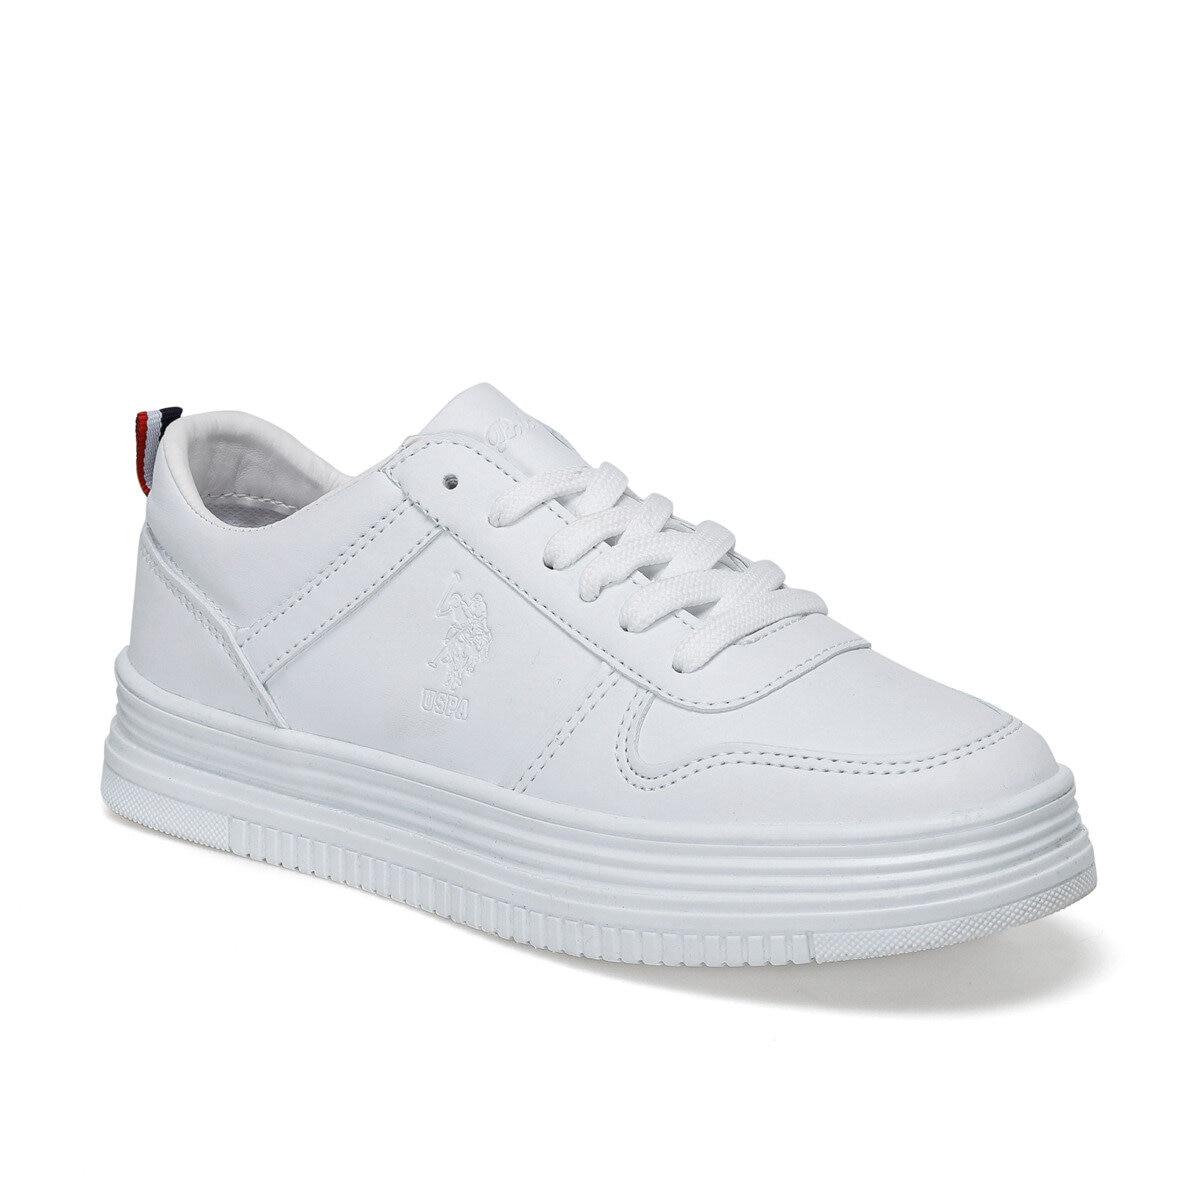 FLO SURI White Women 'S Sneaker U.S. POLO ASSN.